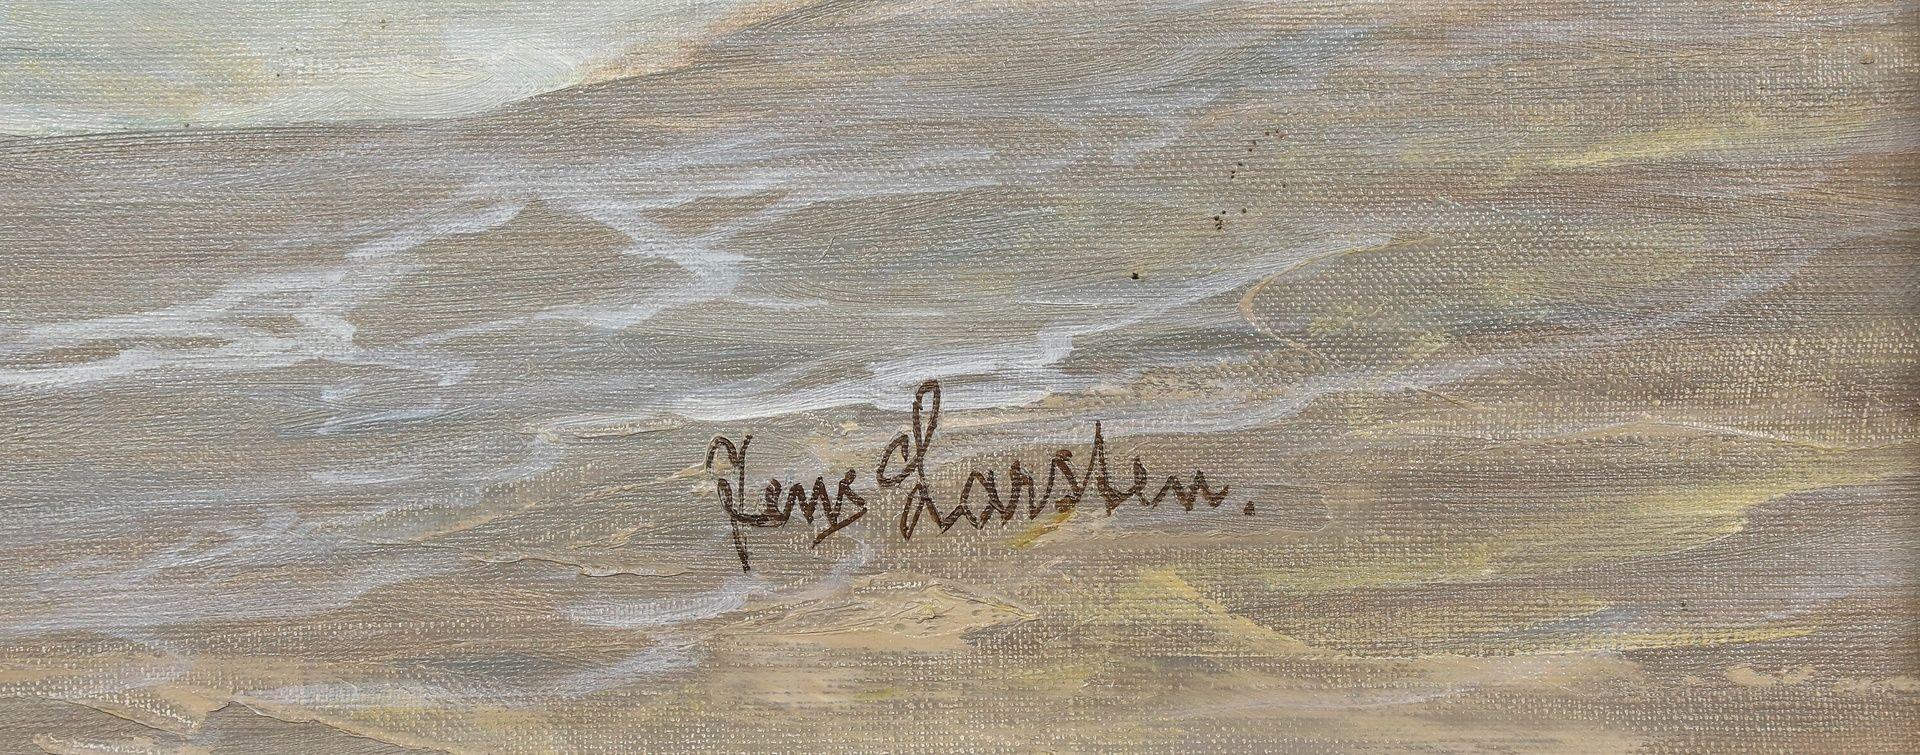 Jens Larsten, Norwegische Küstenszene - Bild 5 aus 5